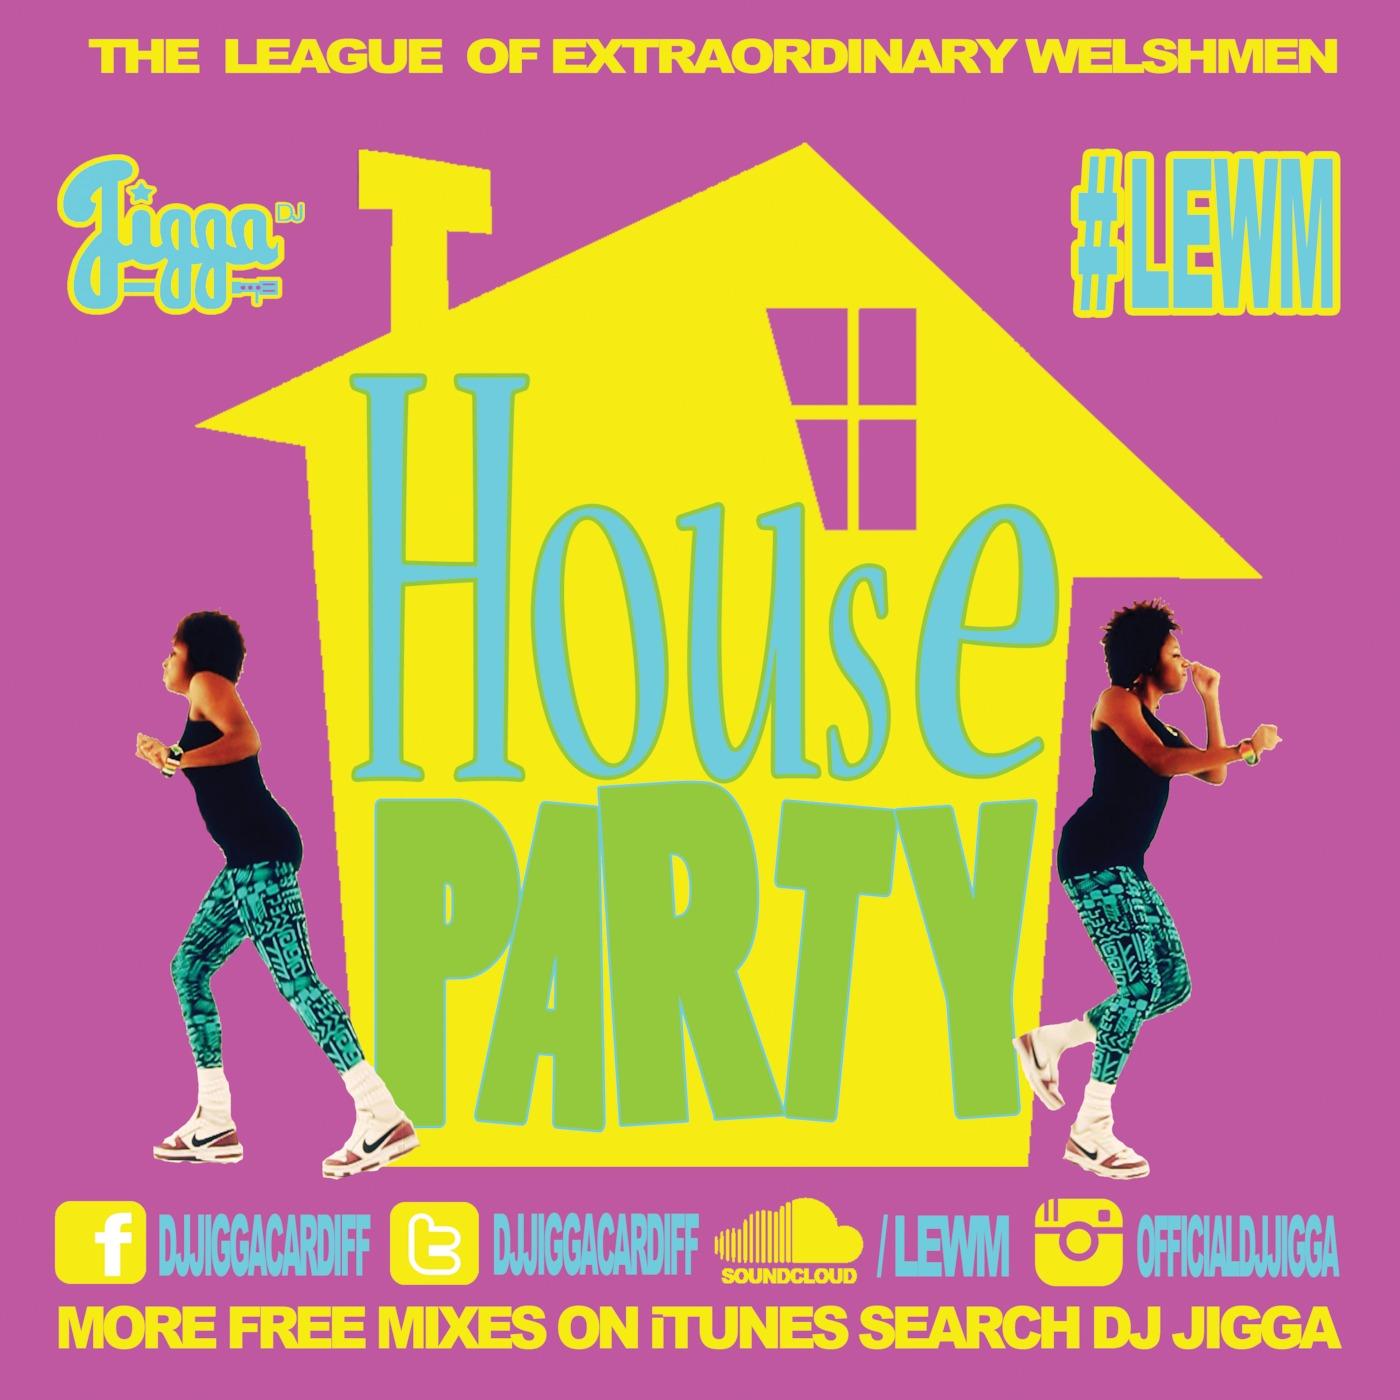 DJ JIGGA Podcast Mixes | Listen Free on Castbox